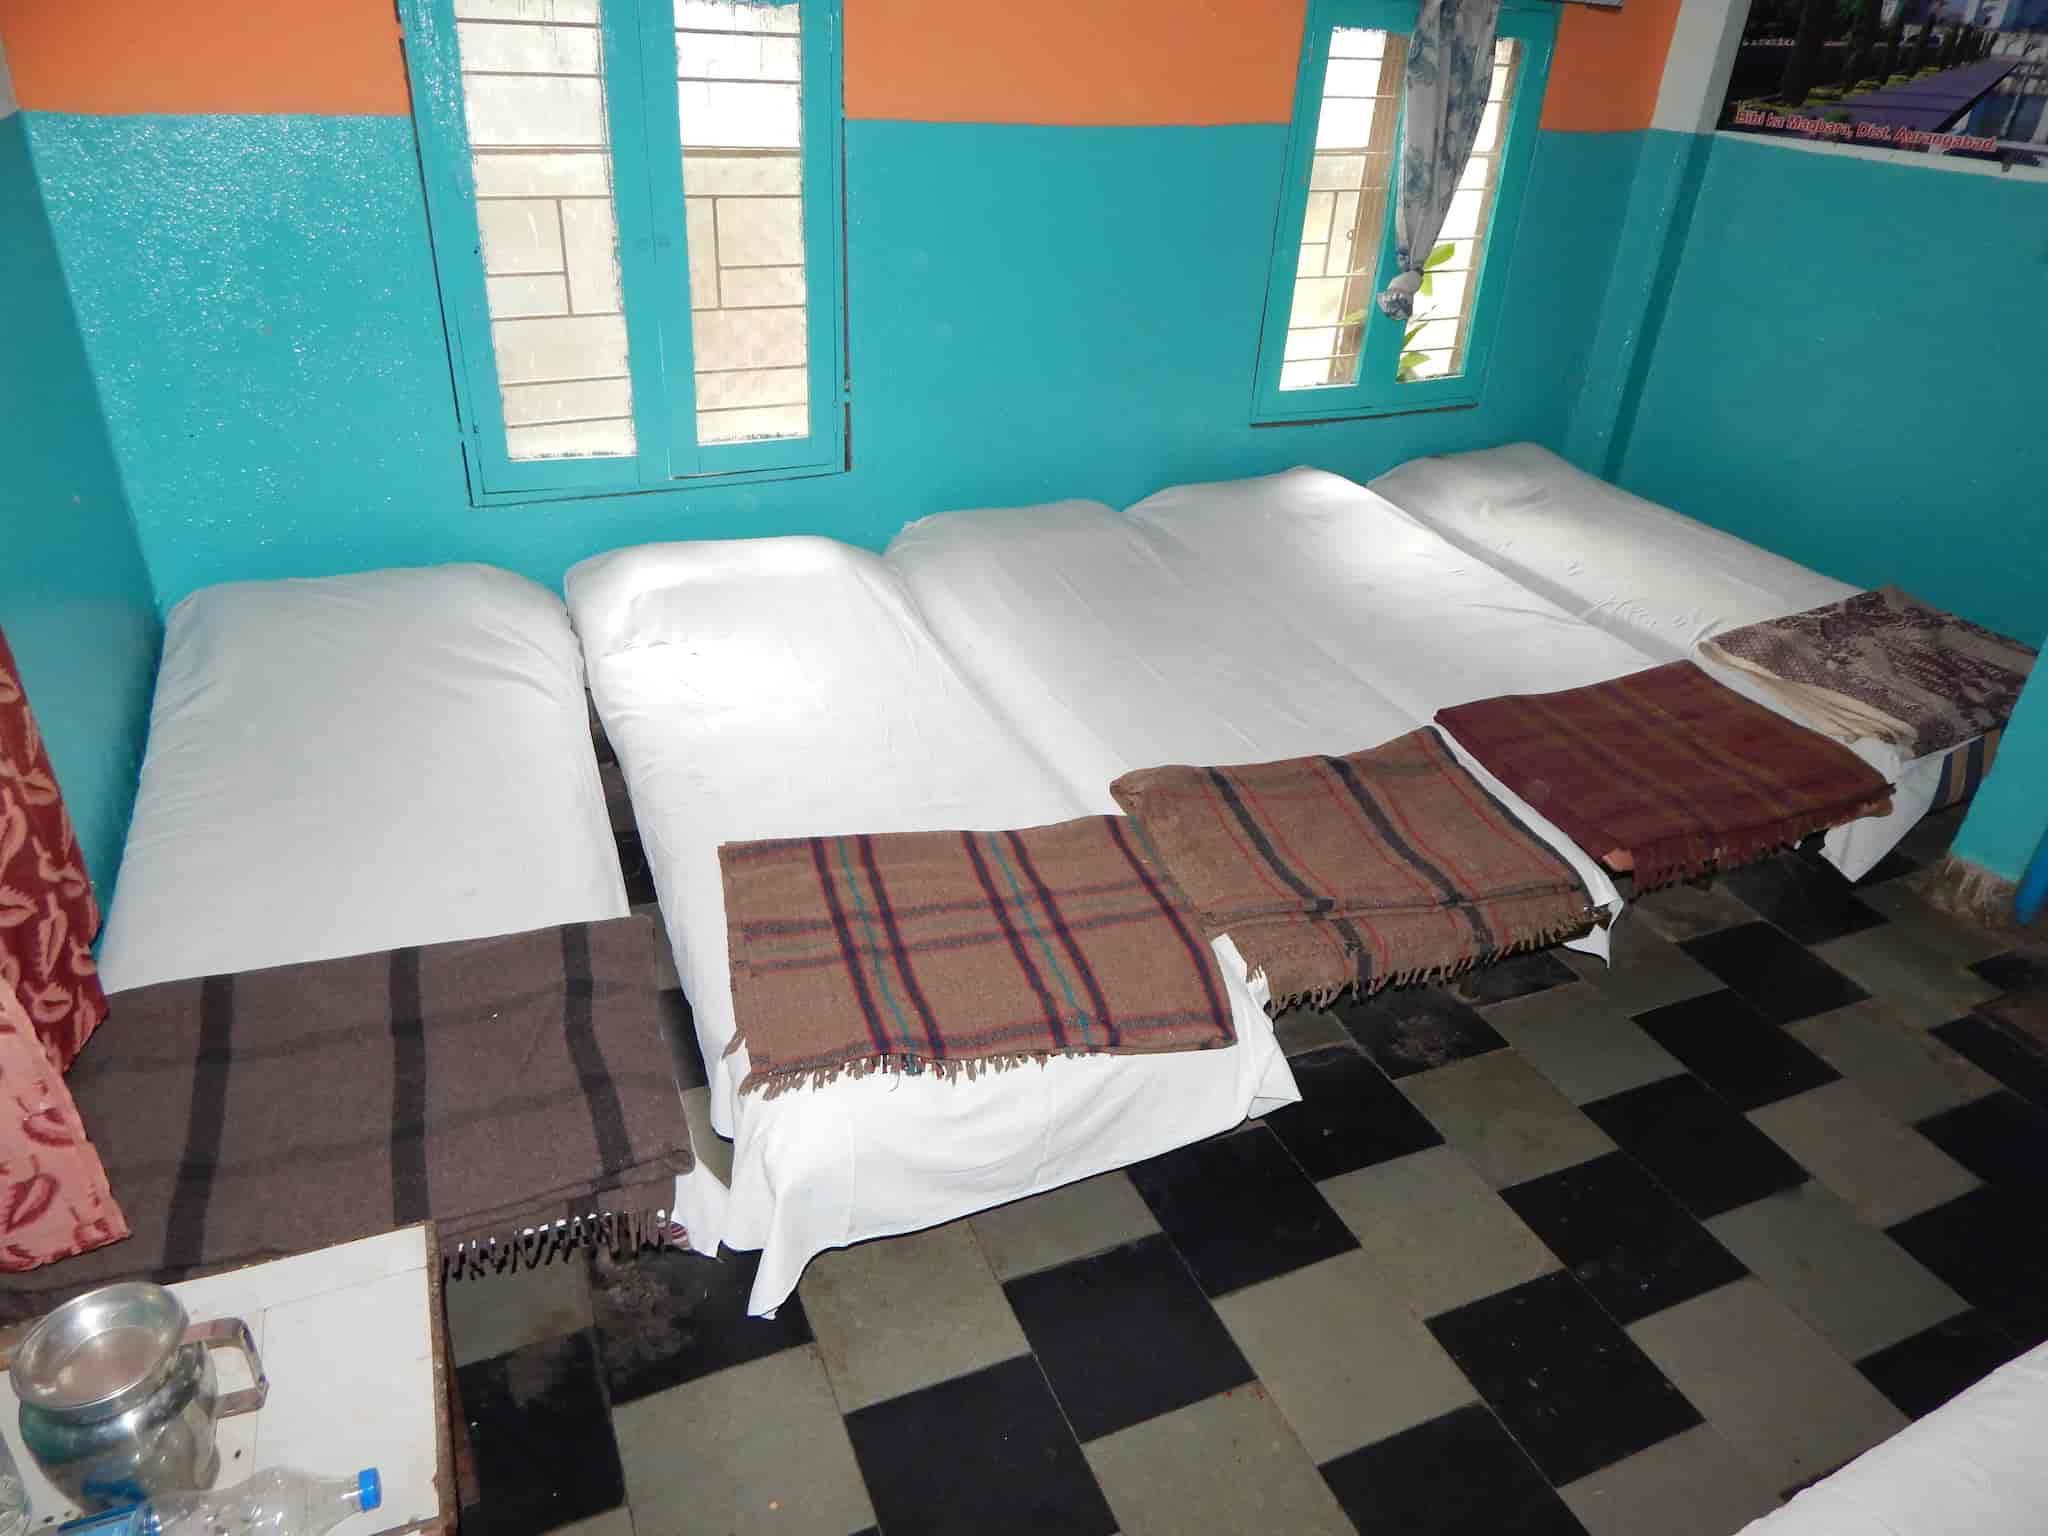 Economy Room Sunder Lodge Photos Samarthnagar Aurangabad Maharashtra Hotels